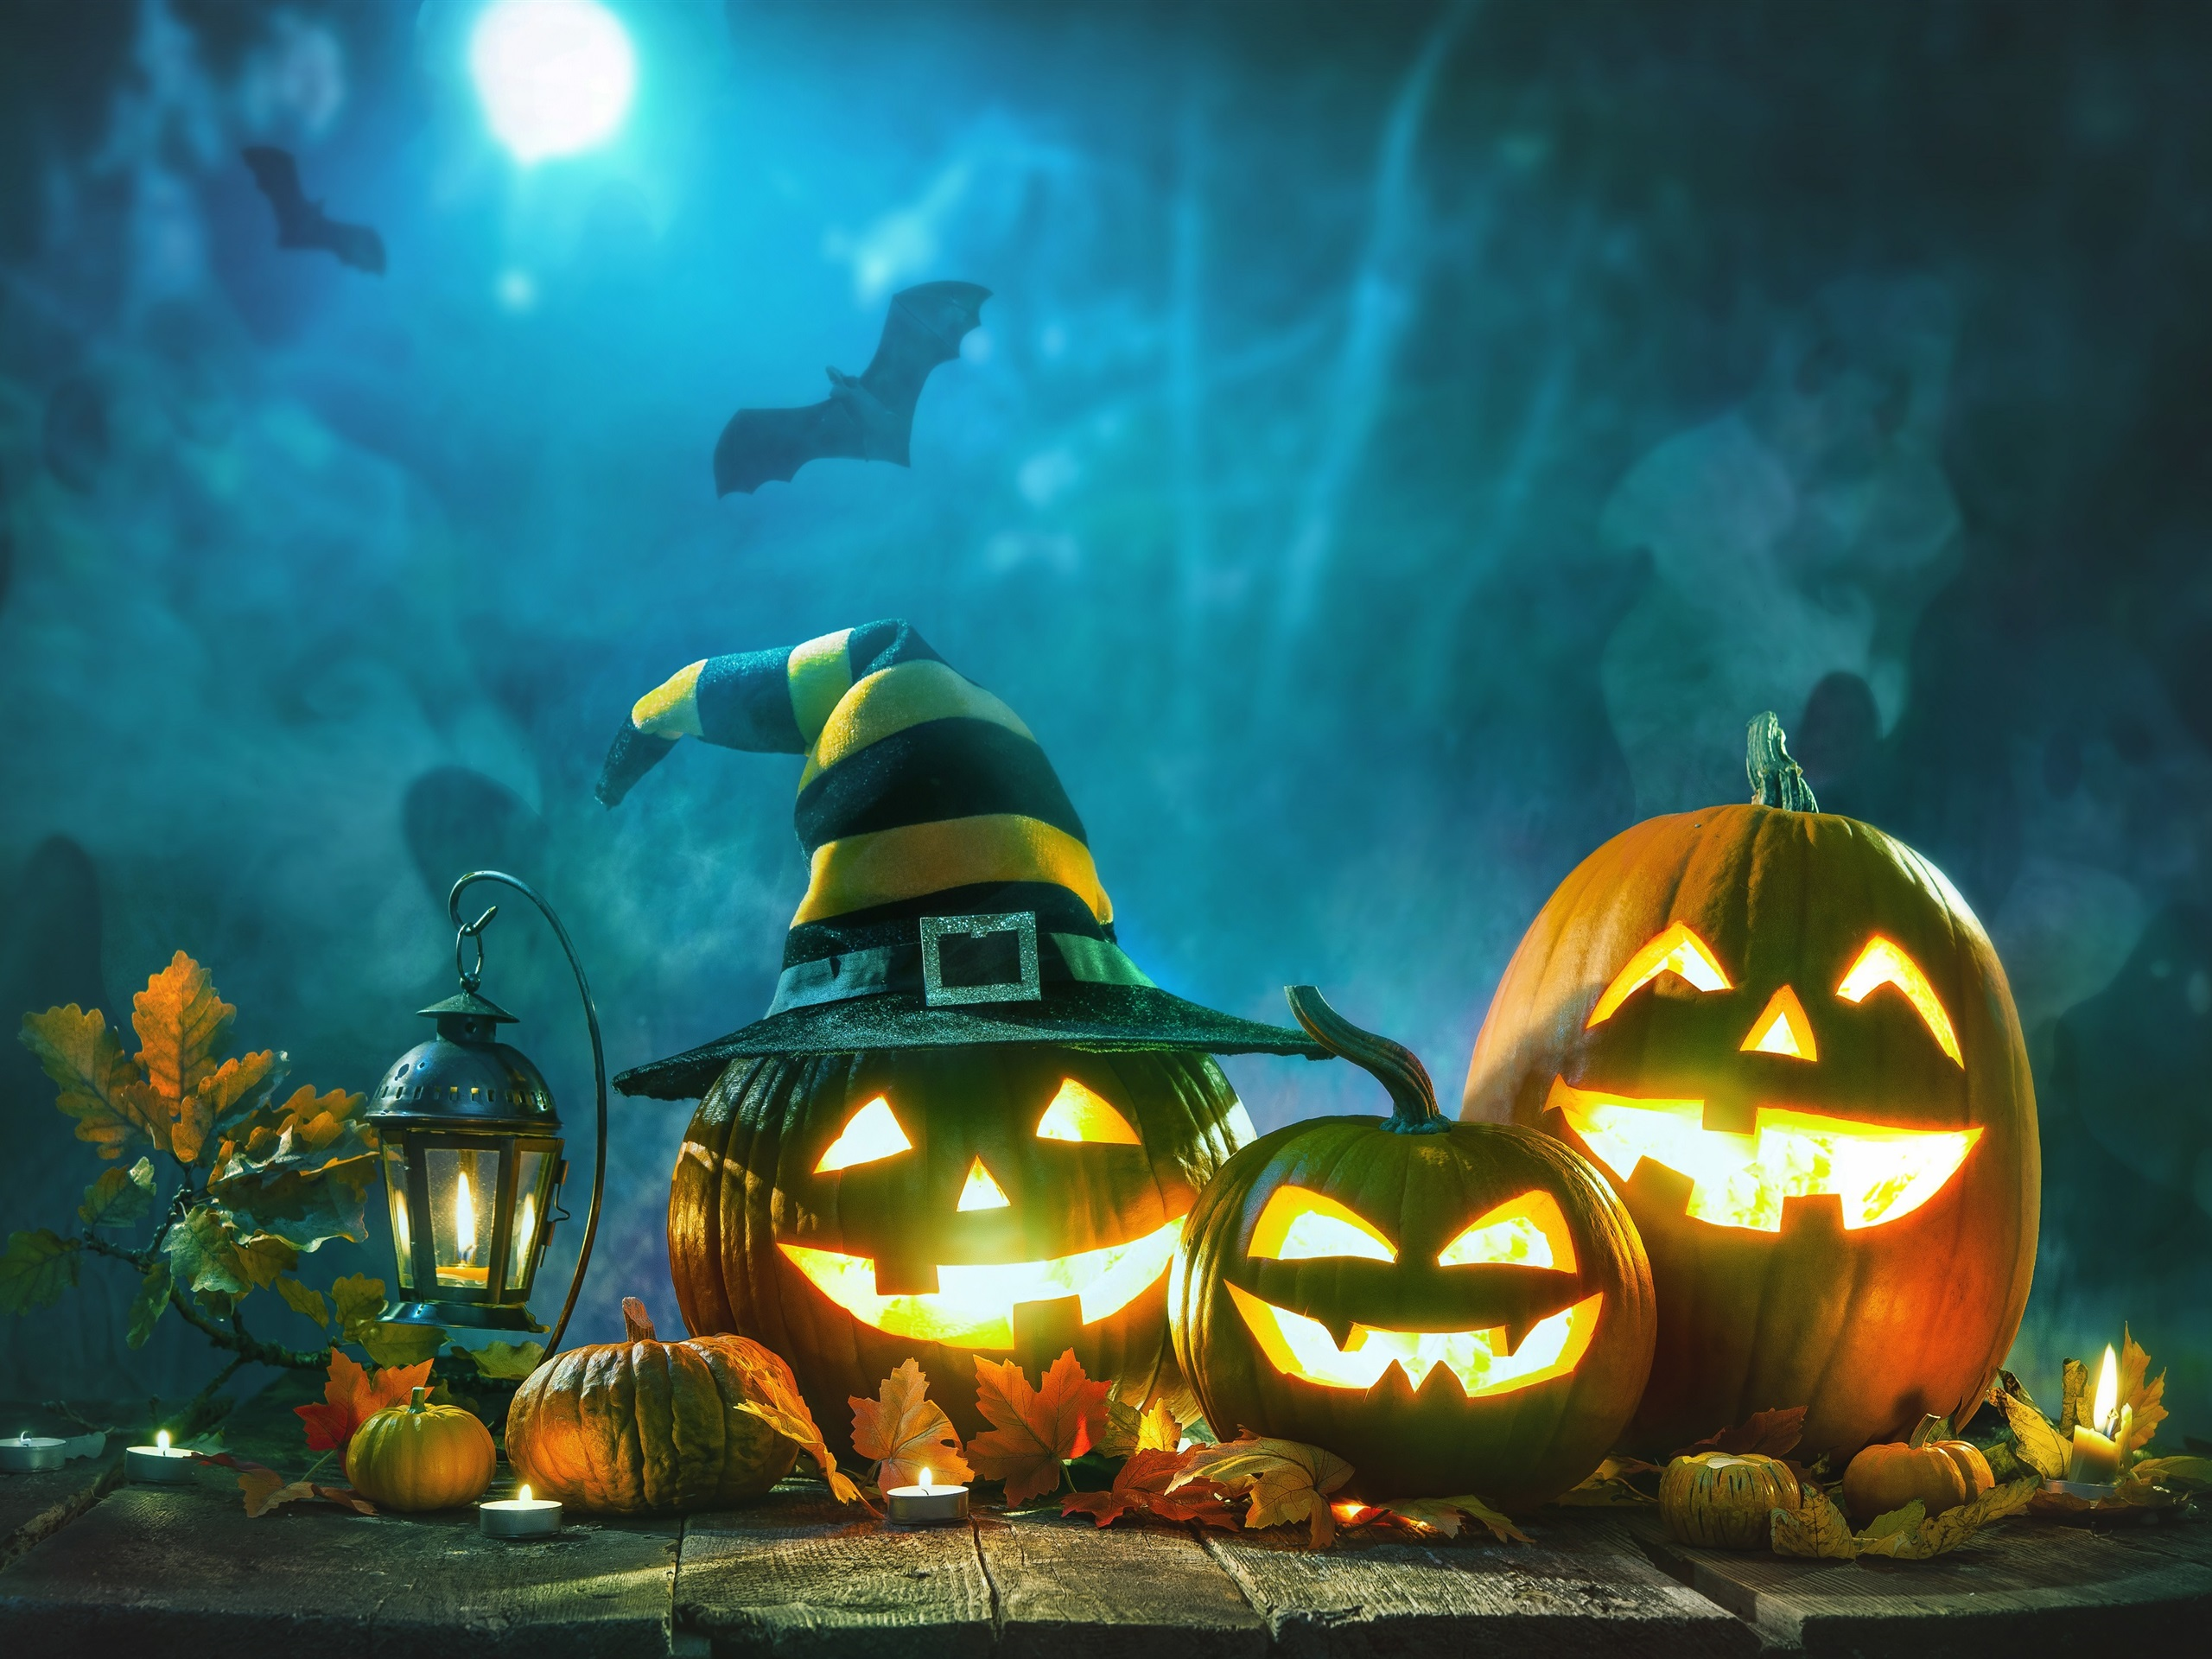 Wallpaper Halloween, pumpkin lamp, night 3840x2160 UHD 4K ...